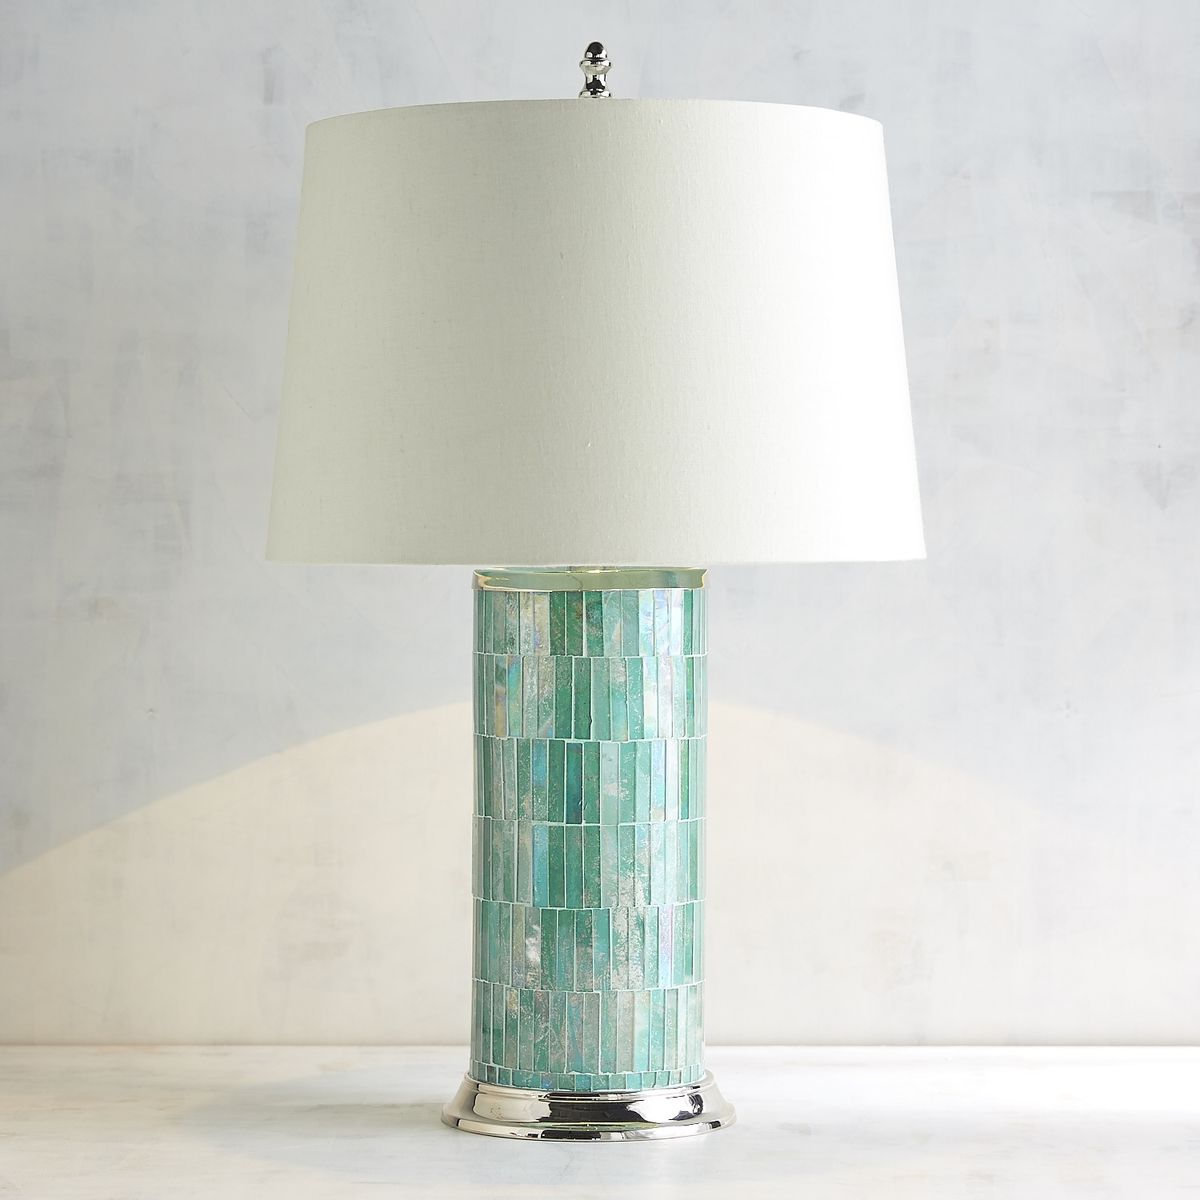 Ideal Mosaic Column Aqua Table Lamp | Everything Turquoise OJ24